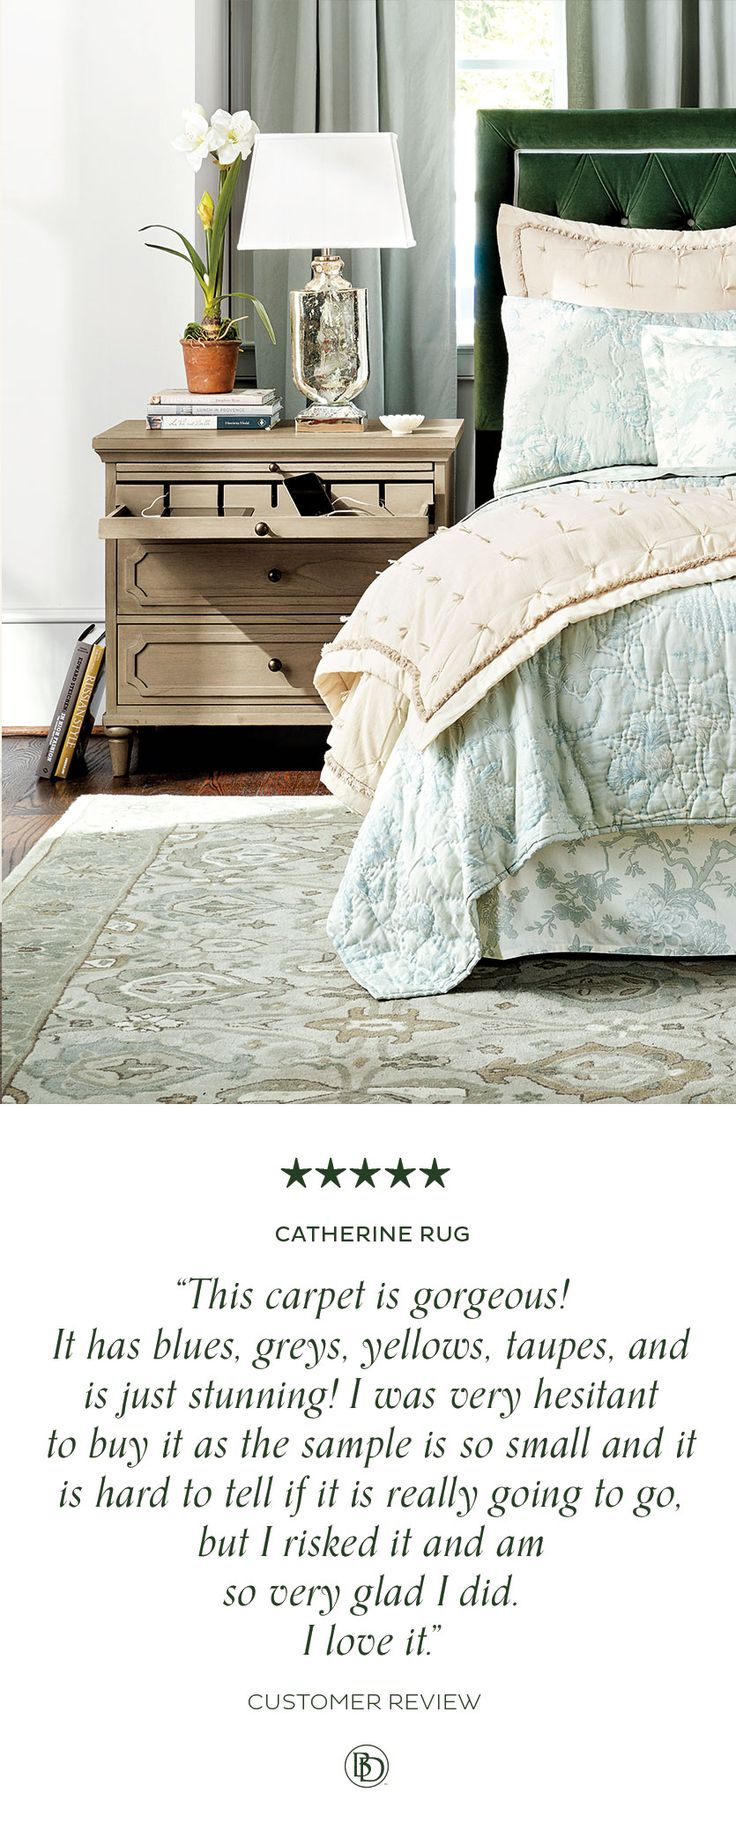 95 best rugs and flooring images on pinterest ballard designs catherine rug ballard designsswatchcatherine